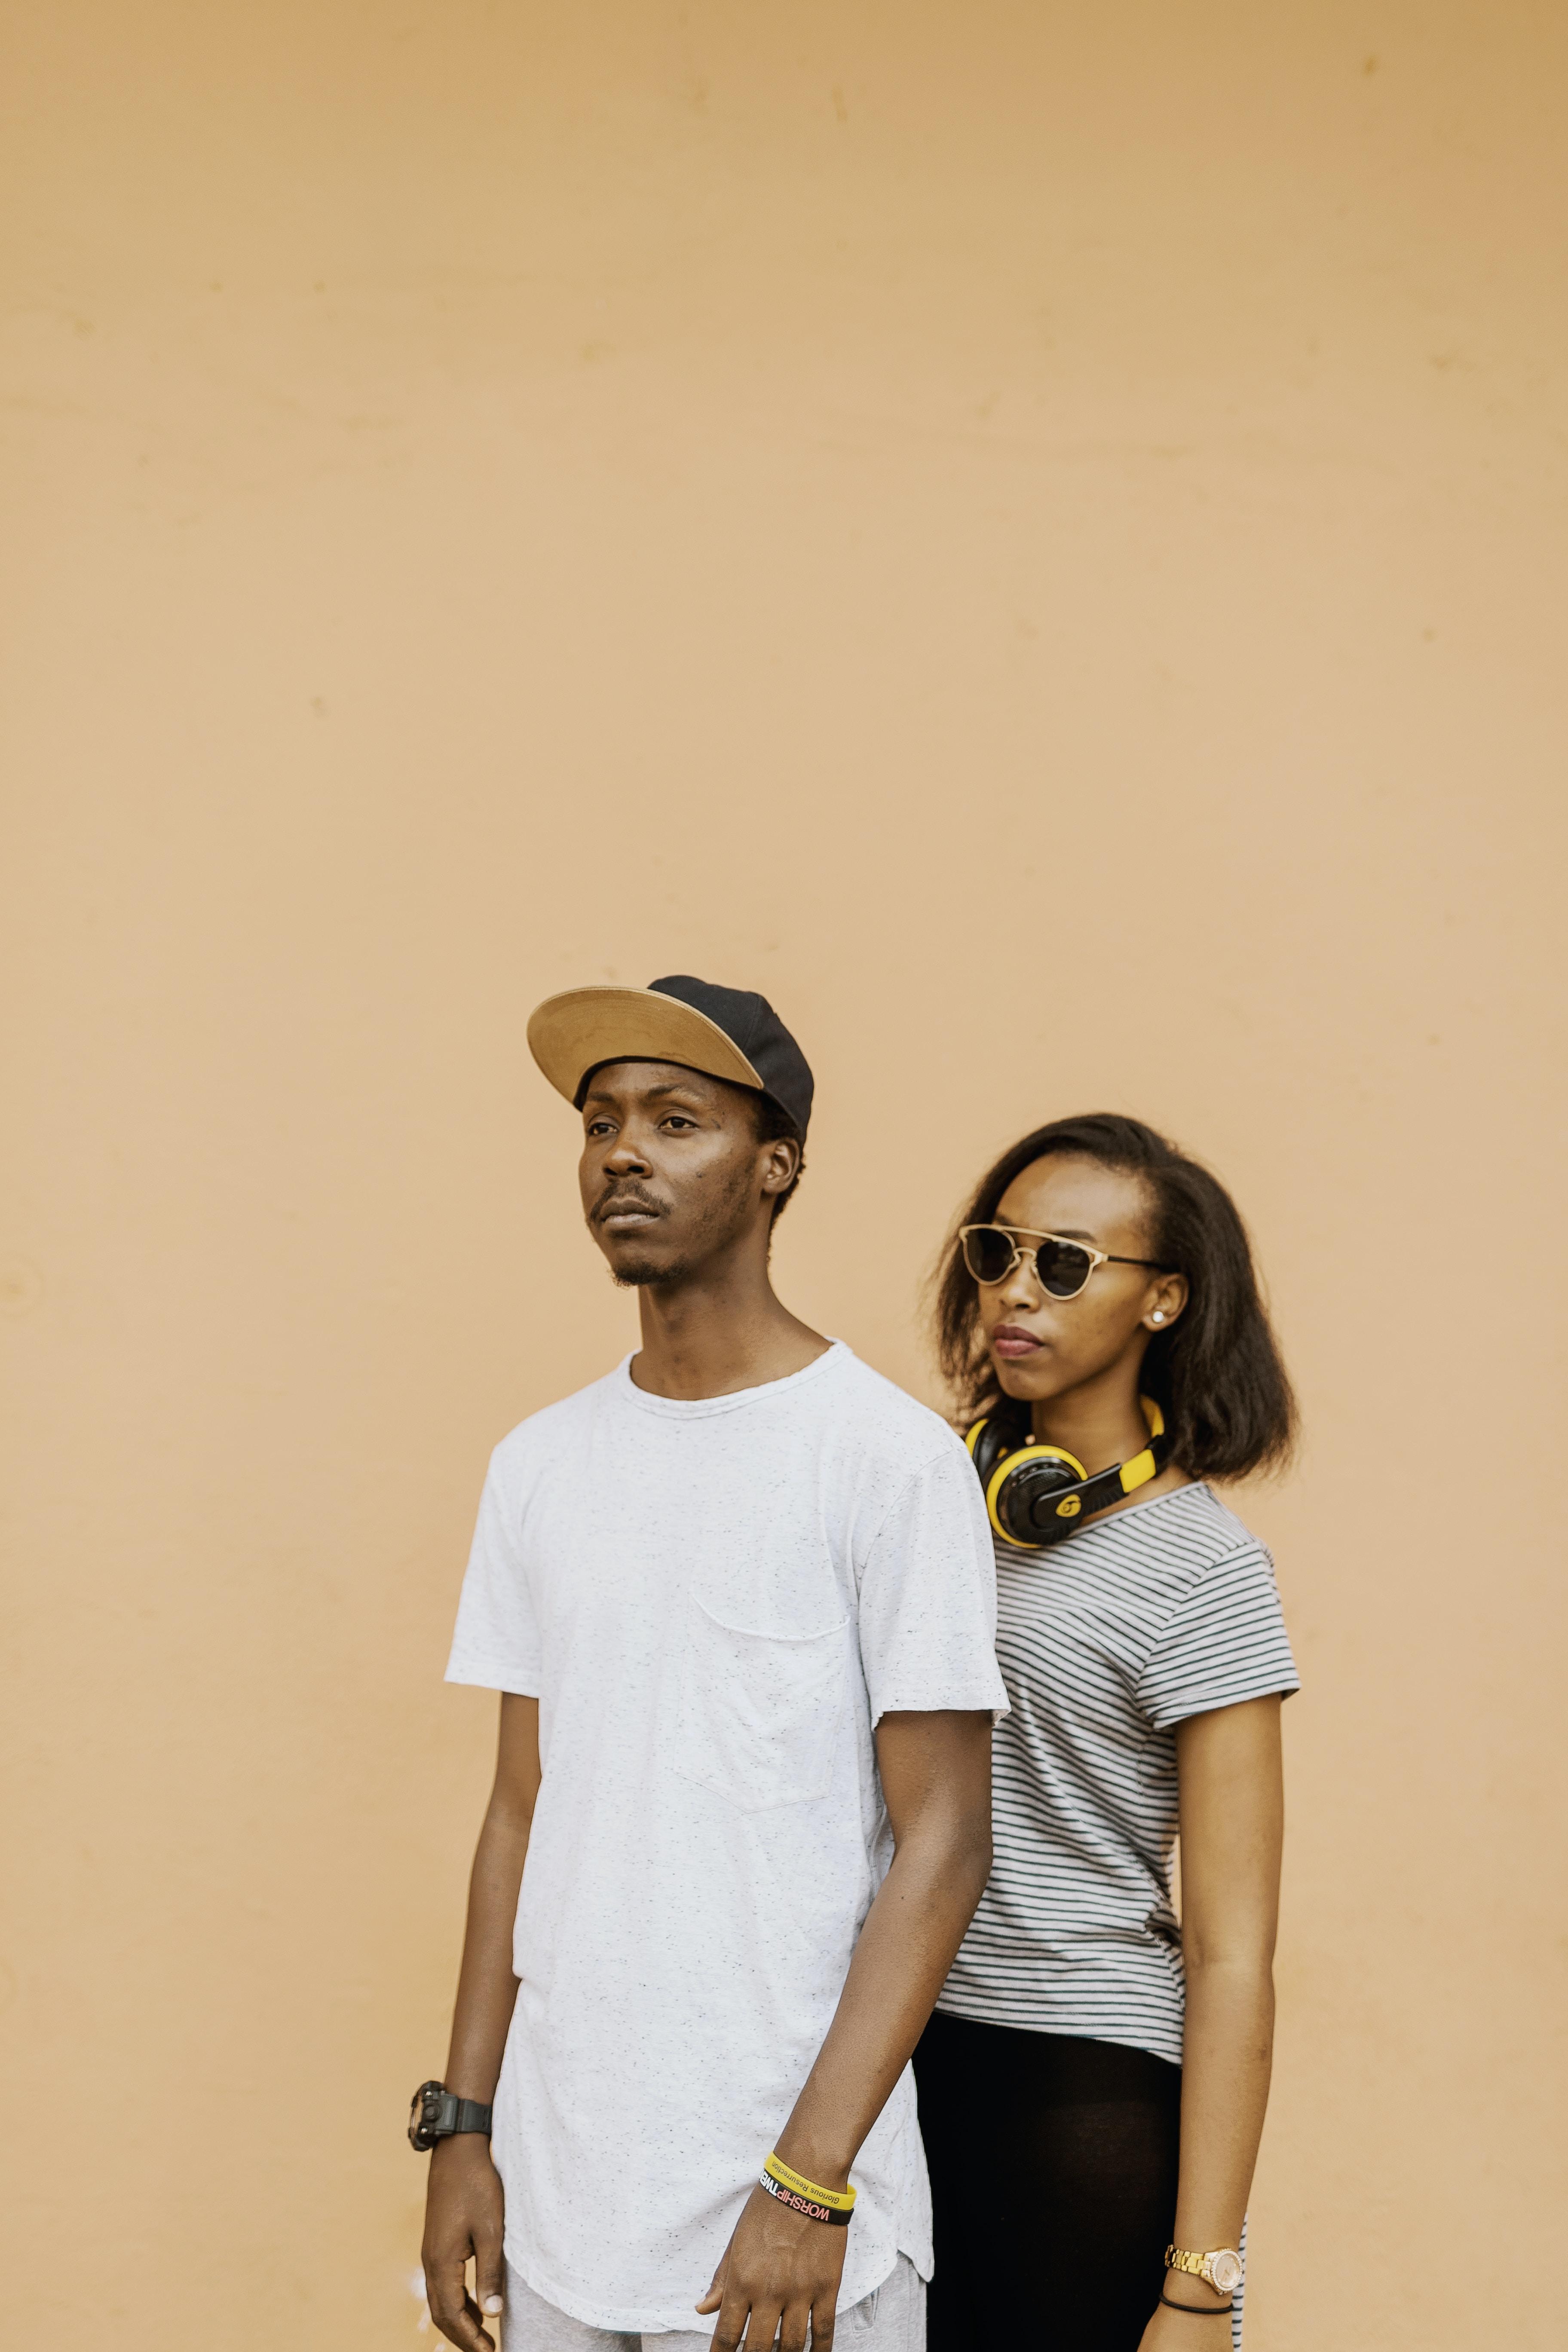 man beside woman wearing sunglasses